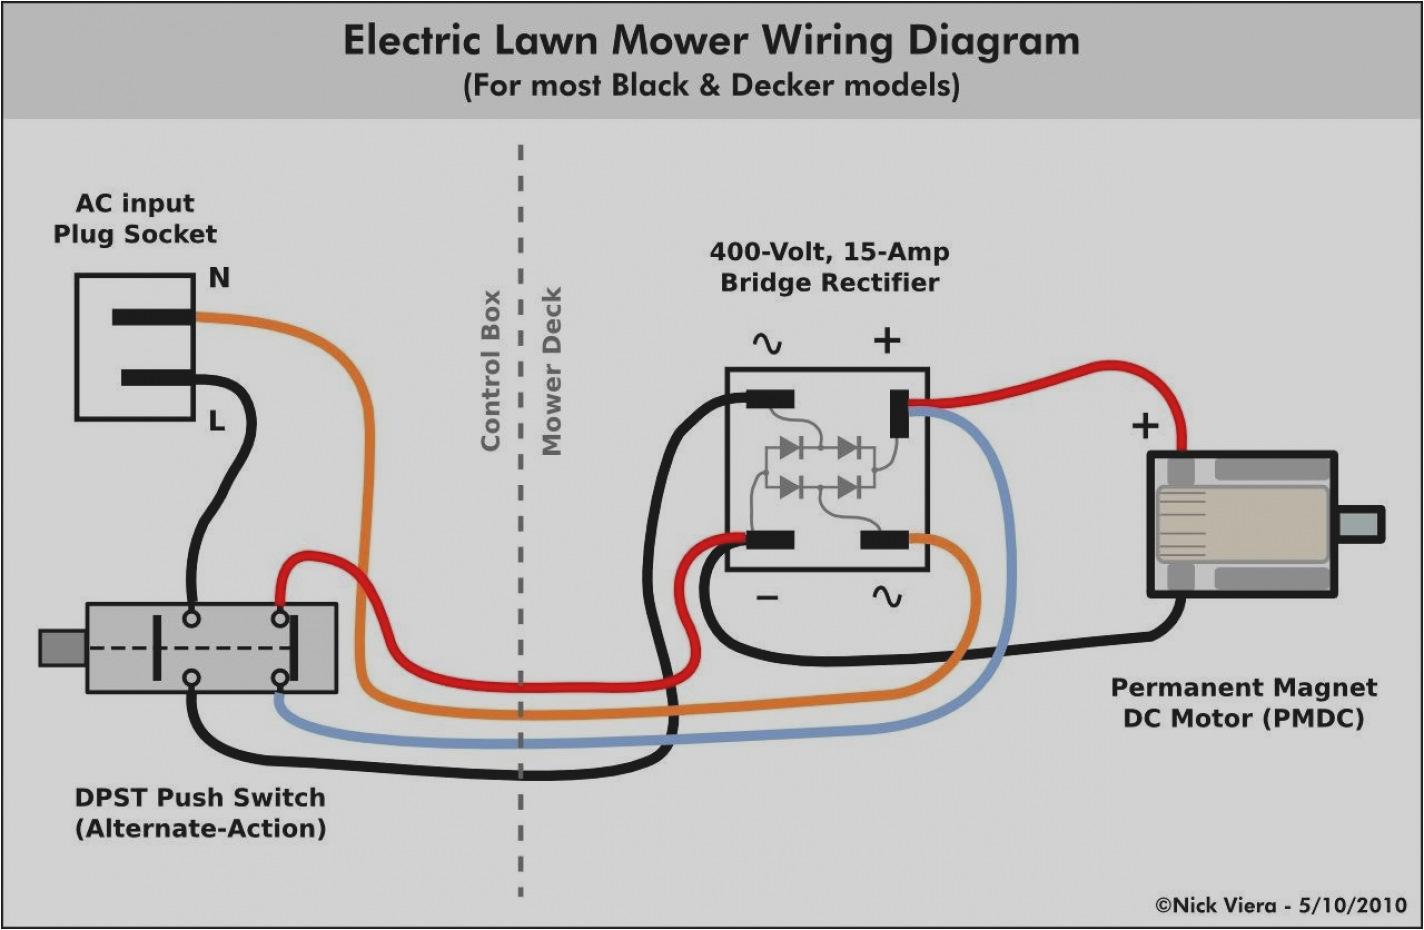 4 wire dc motor diagram wiring diagram newdc motors wiring diagram wiring diagrams konsult 4 wire